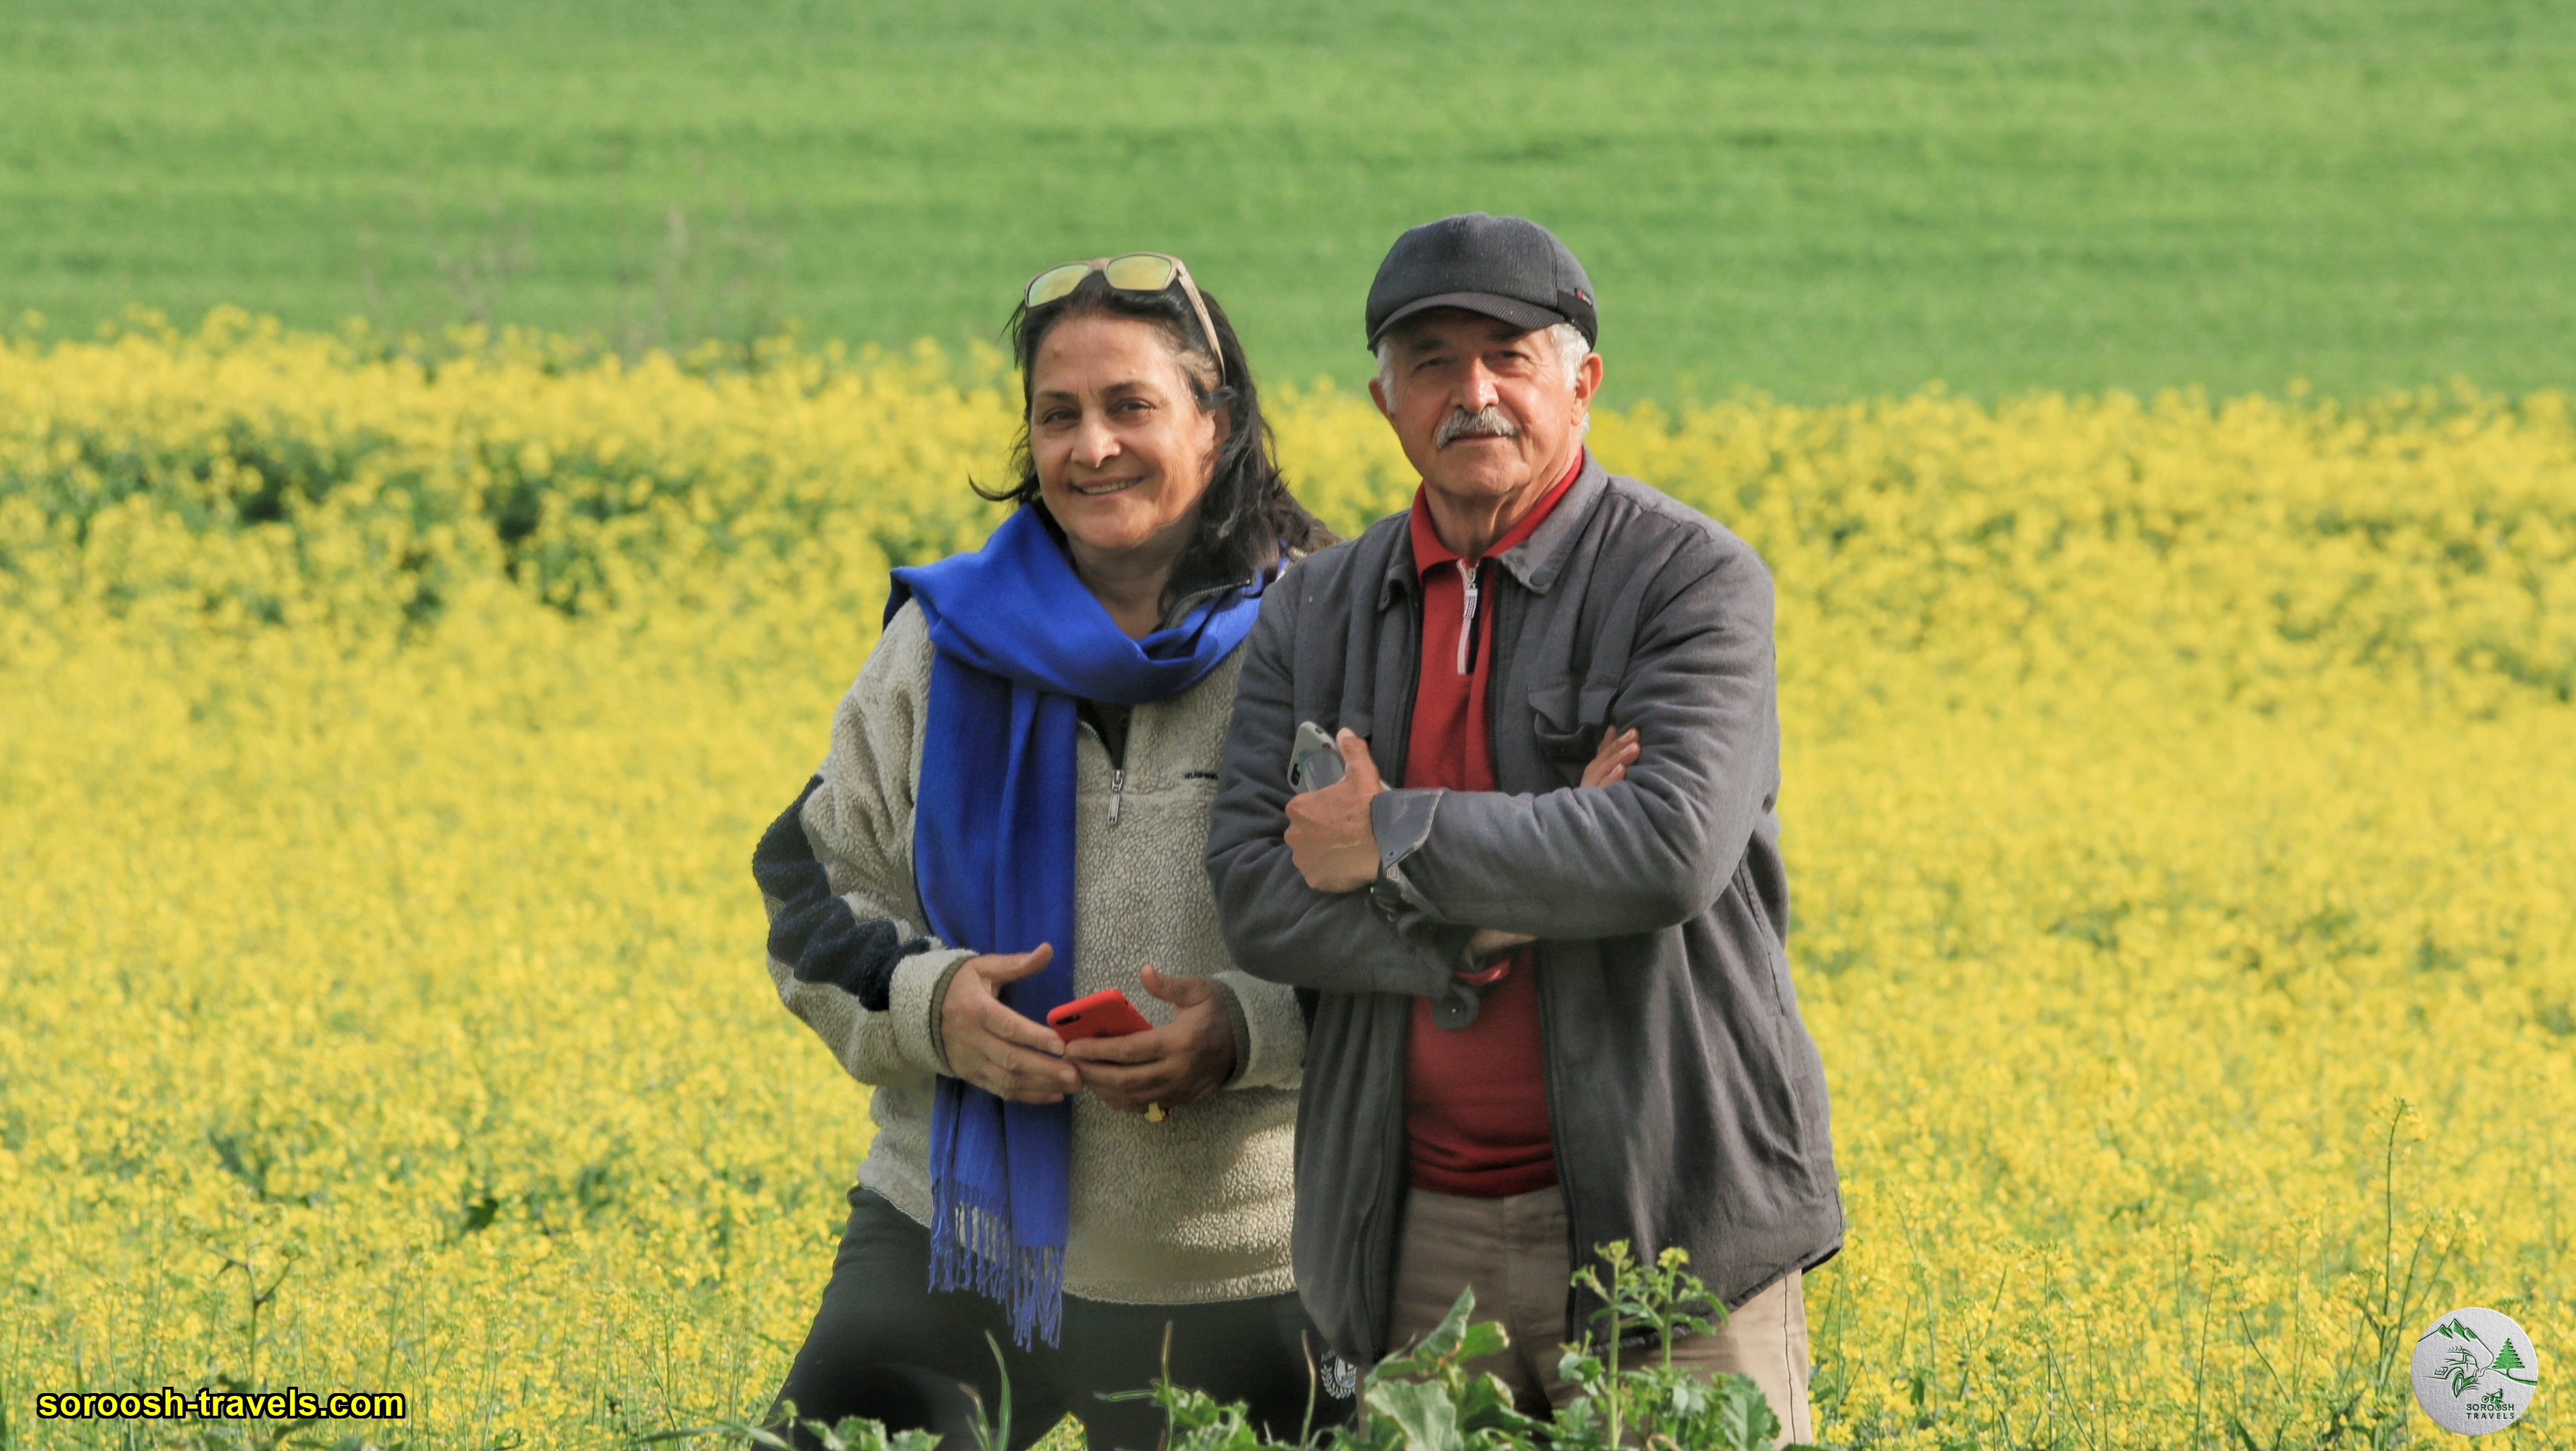 مزارع تورکمن صحرا - نوروز 1400